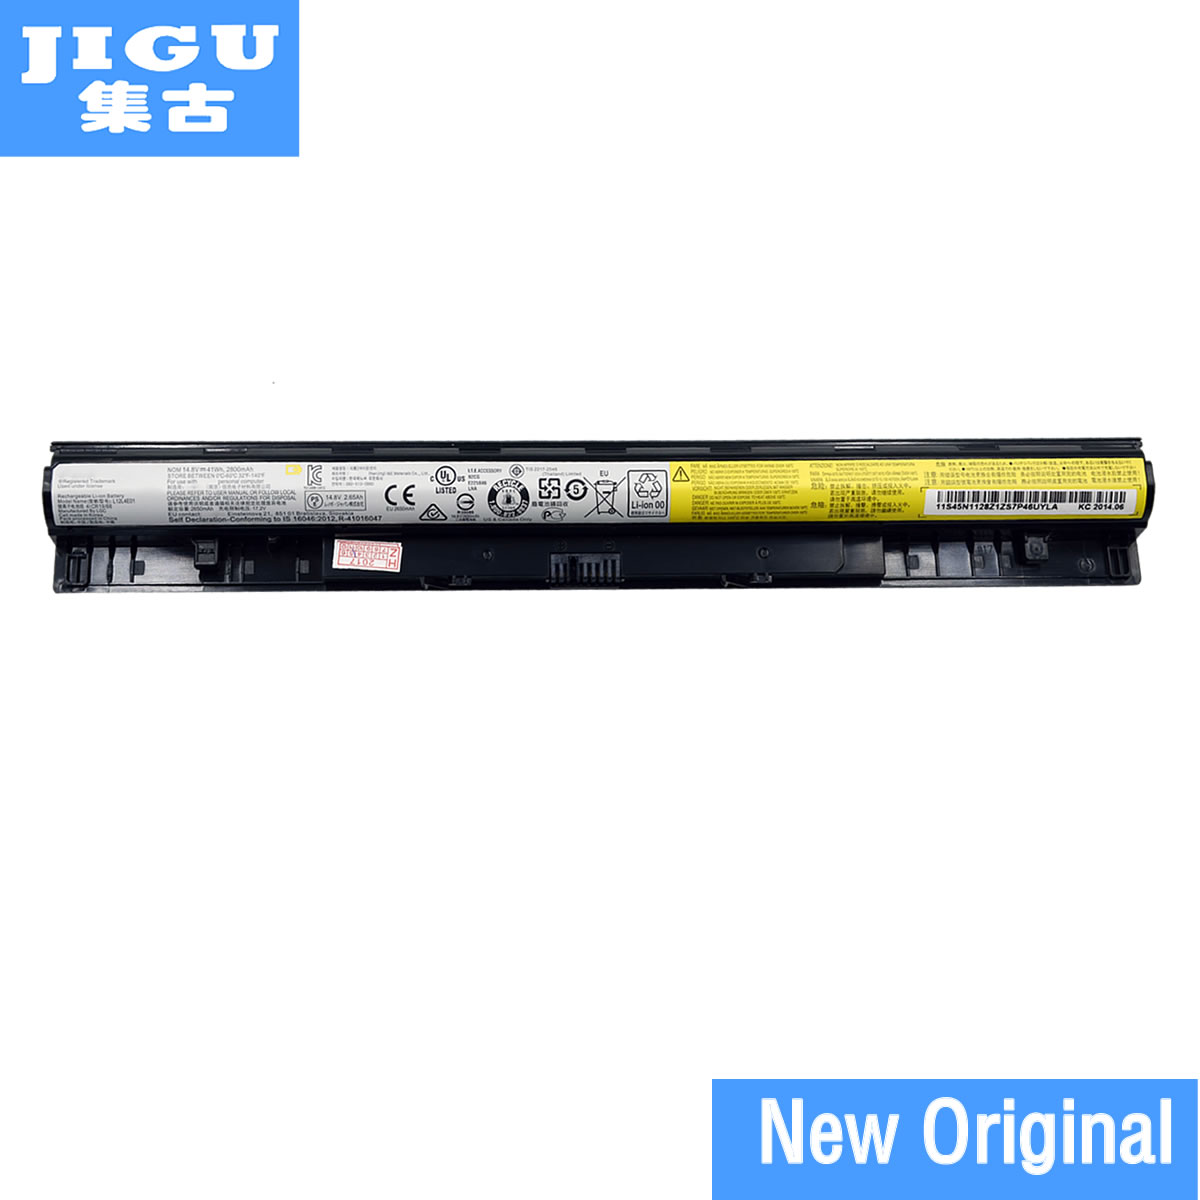 JIGU Original L12L4E01 Laptop Battery For LENOVO G400S G405S G410S G500S G505S G510S S410P S510P Z710 L12S4A02 L12M4E01 L12S4E01